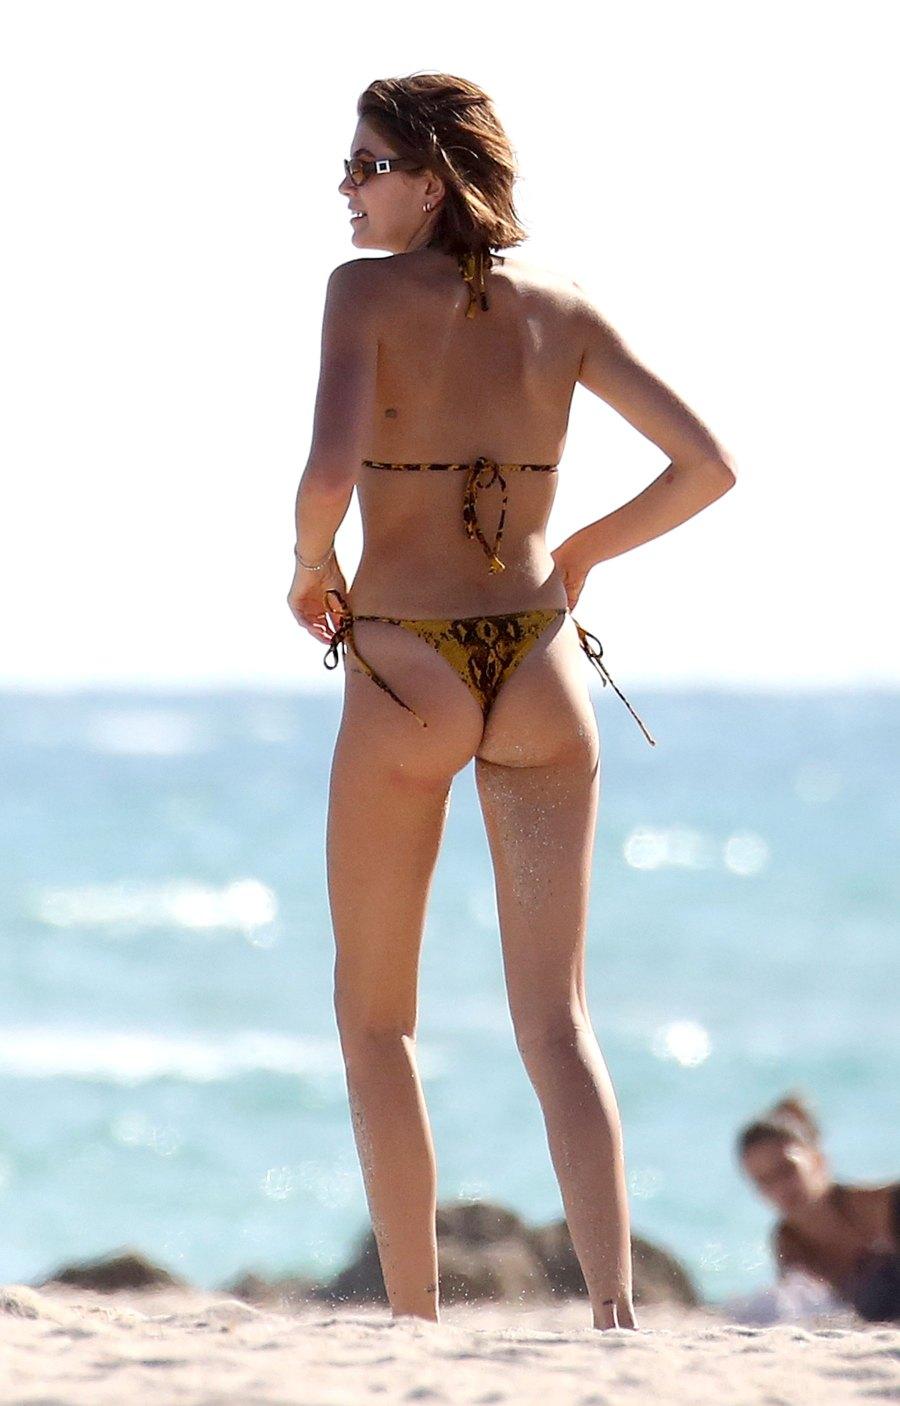 Pete Davidson Kisses Girlfriend Kaia Gerber During PDA-Filled Beach Date